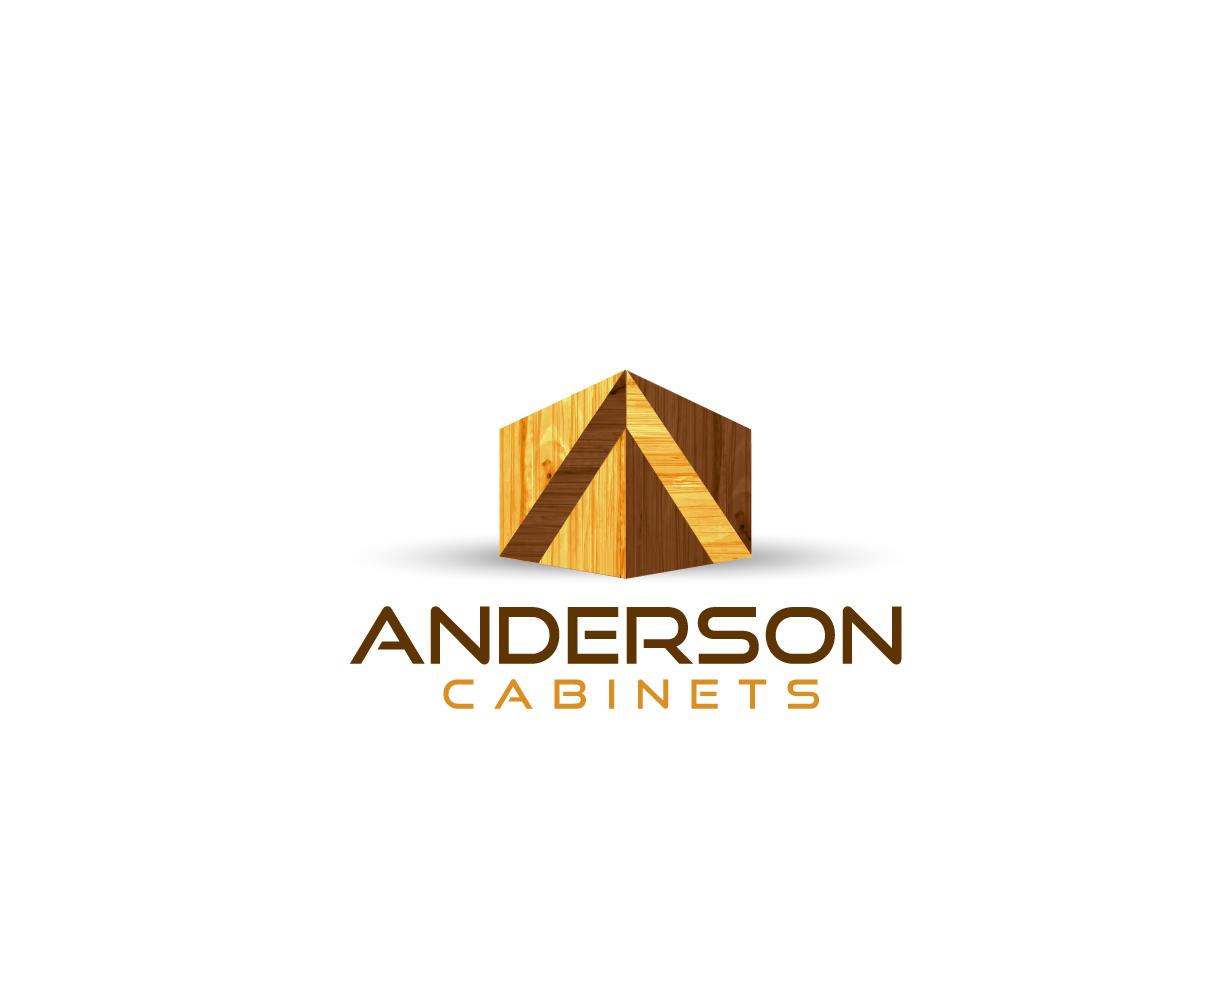 Logo Design By Costur For Anderson Cabinets | Design #17169076